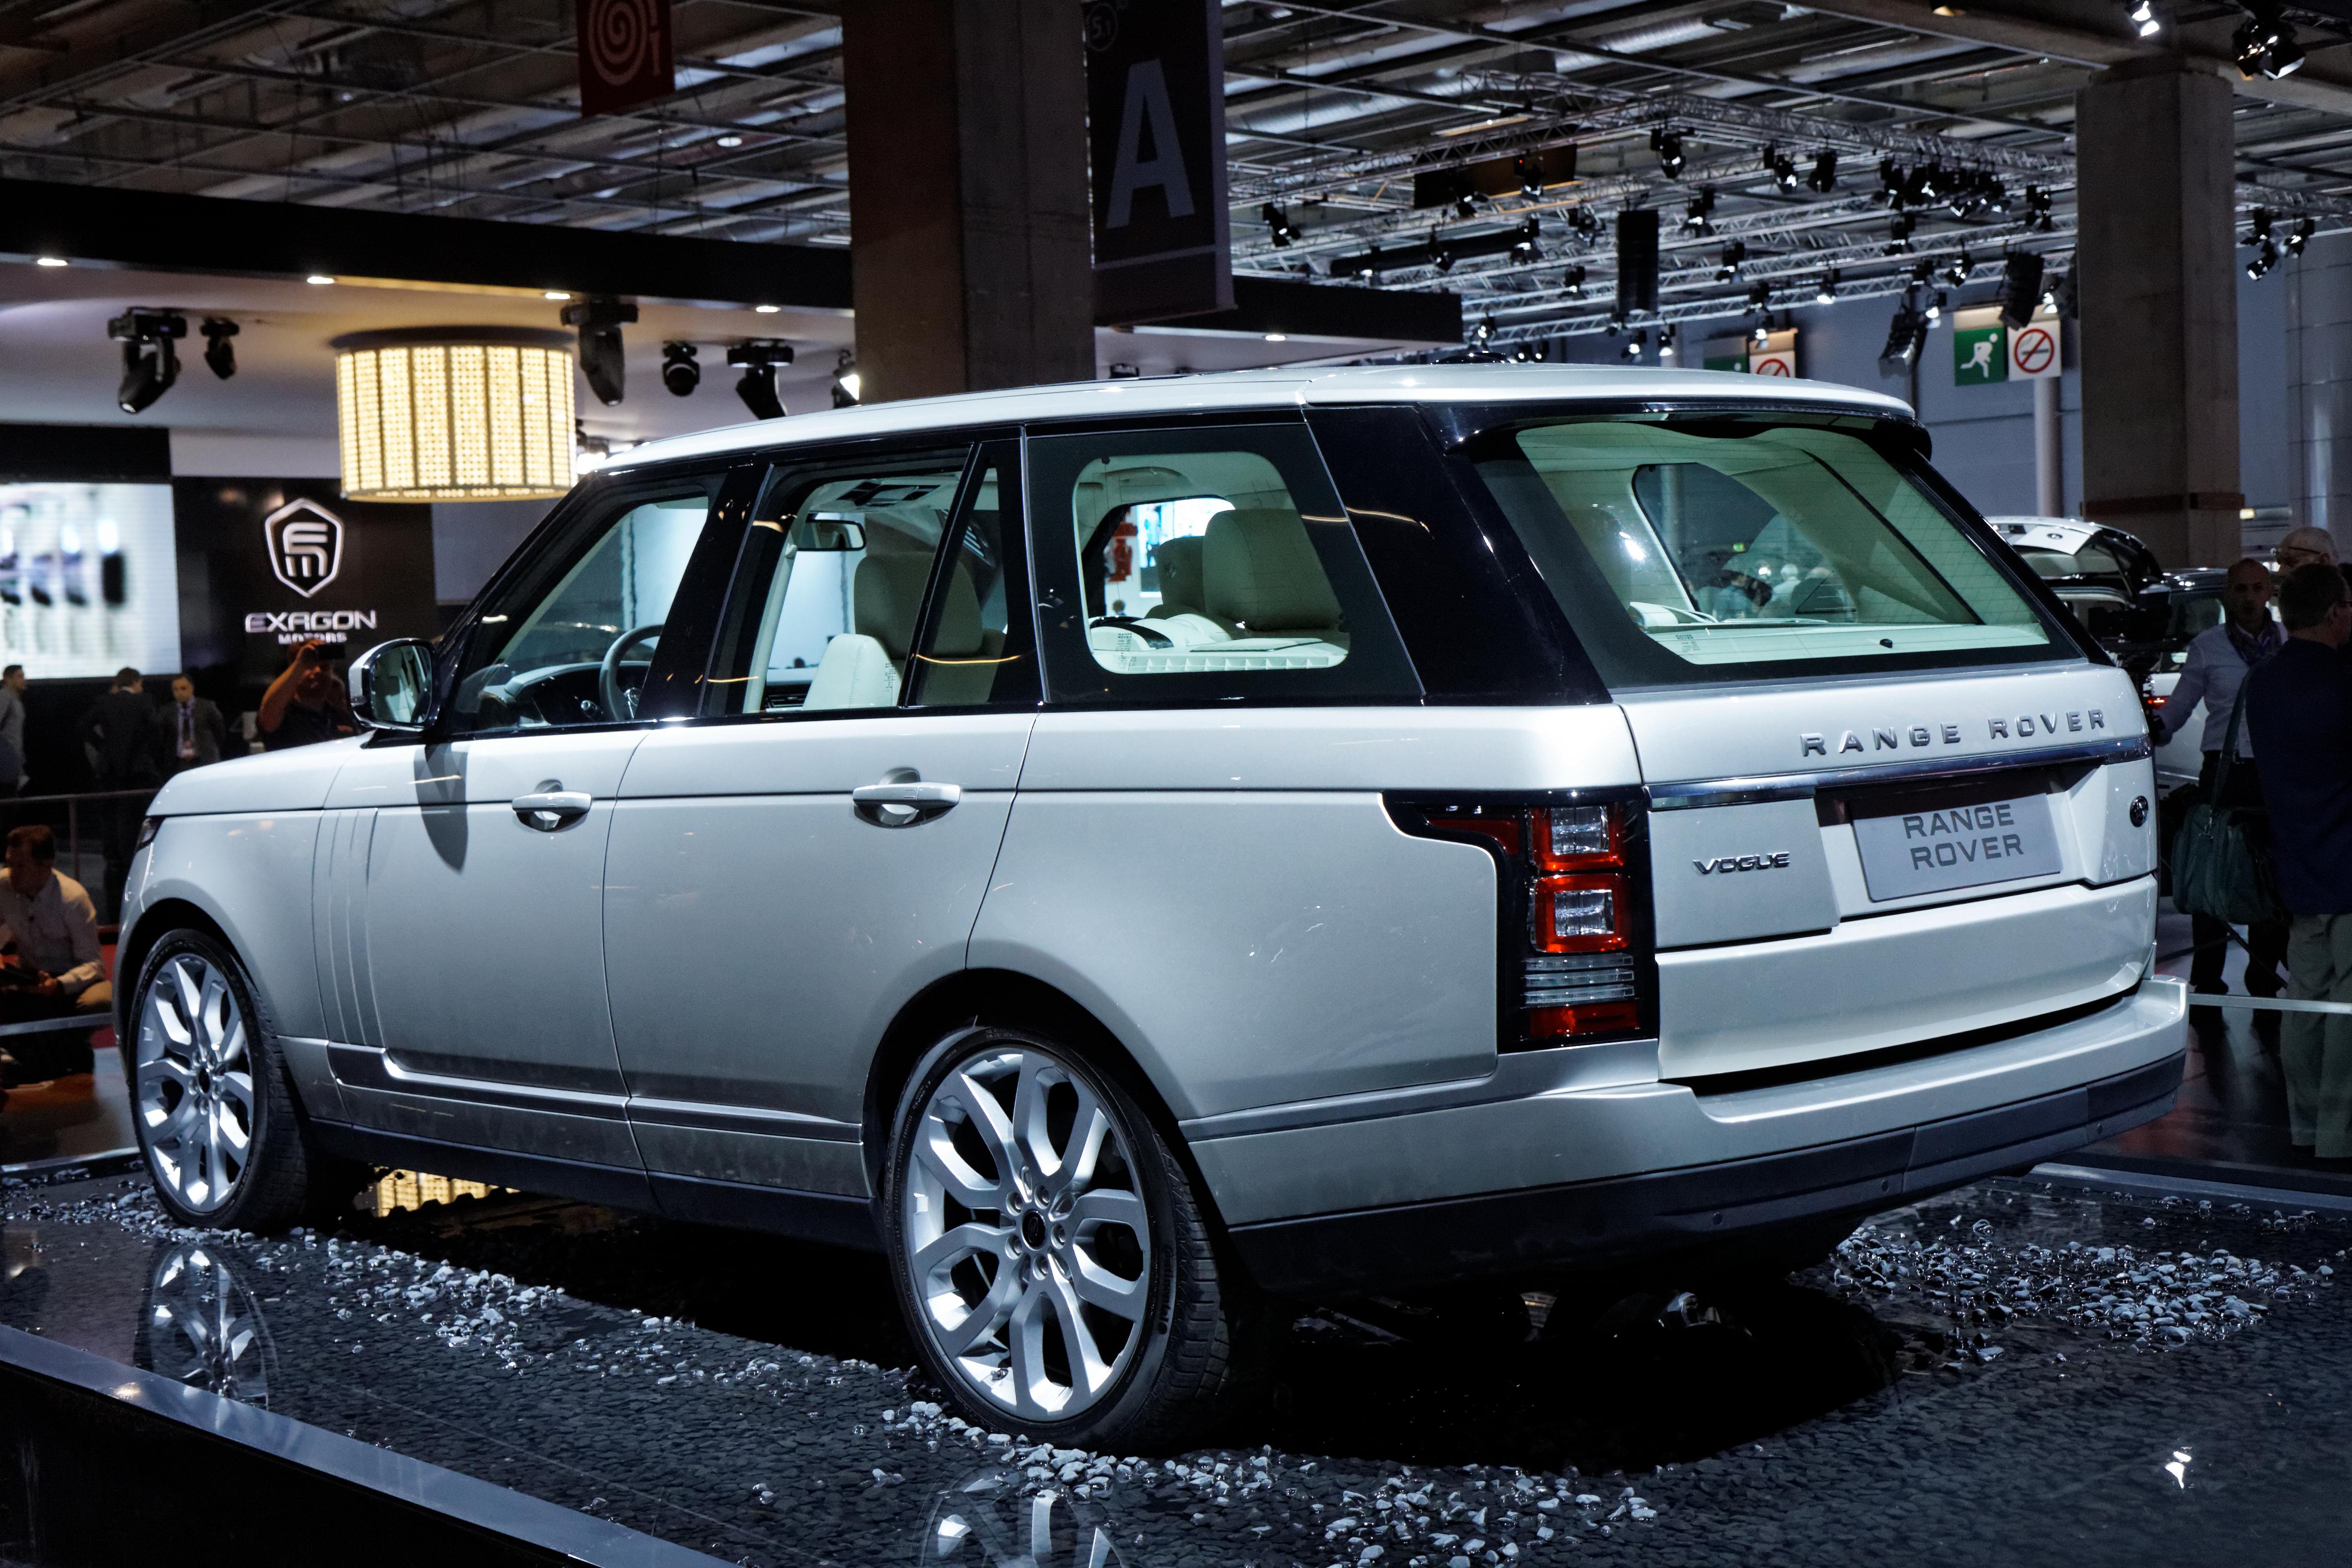 file land rover range rover mondial de l 39 automobile de. Black Bedroom Furniture Sets. Home Design Ideas